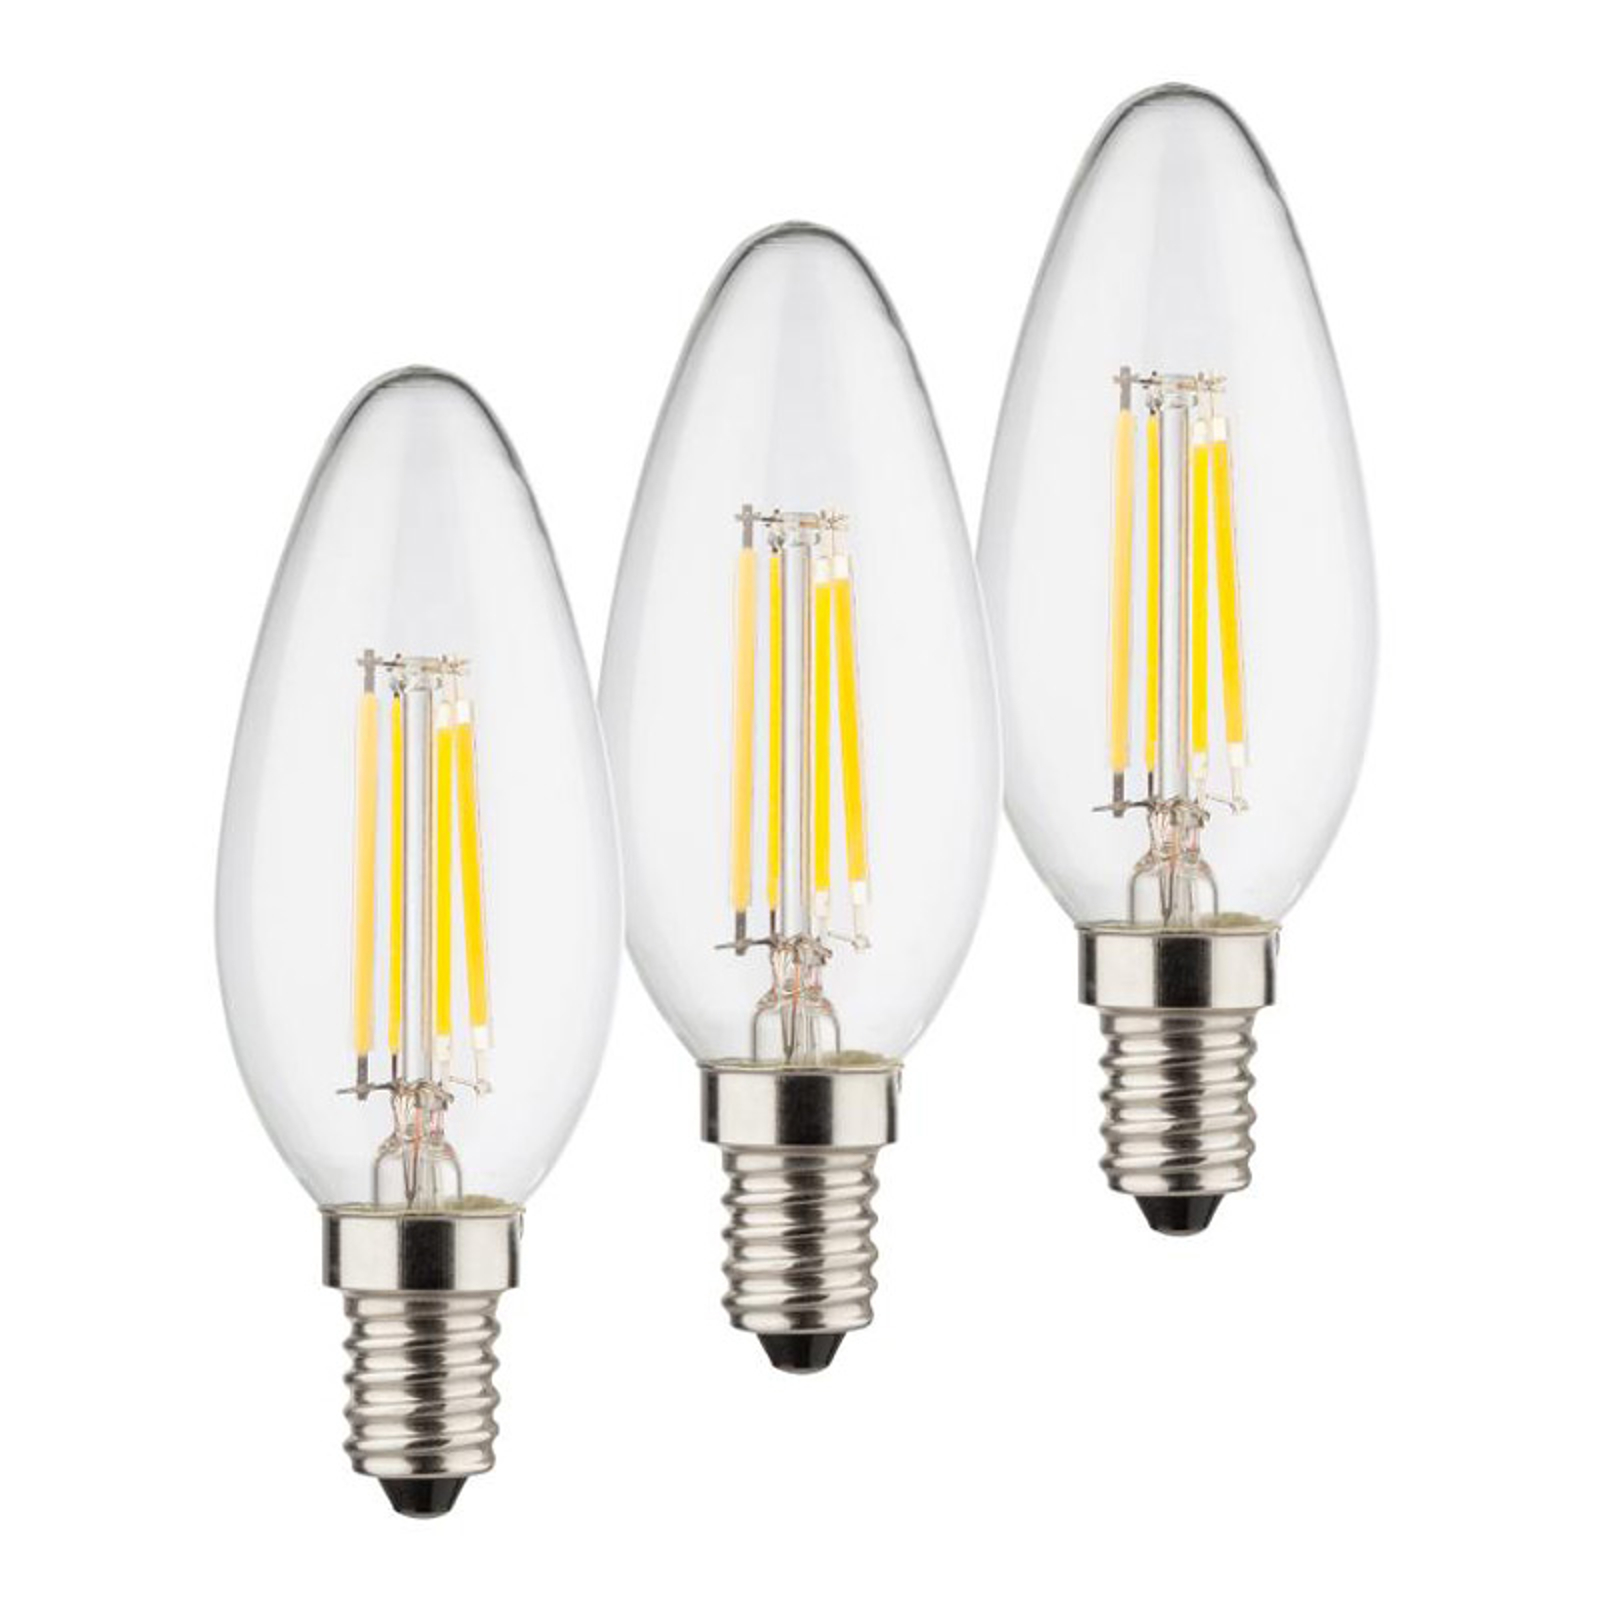 LED-kynttilälamppu E14 4W 2 700 K Filament 3 kpl